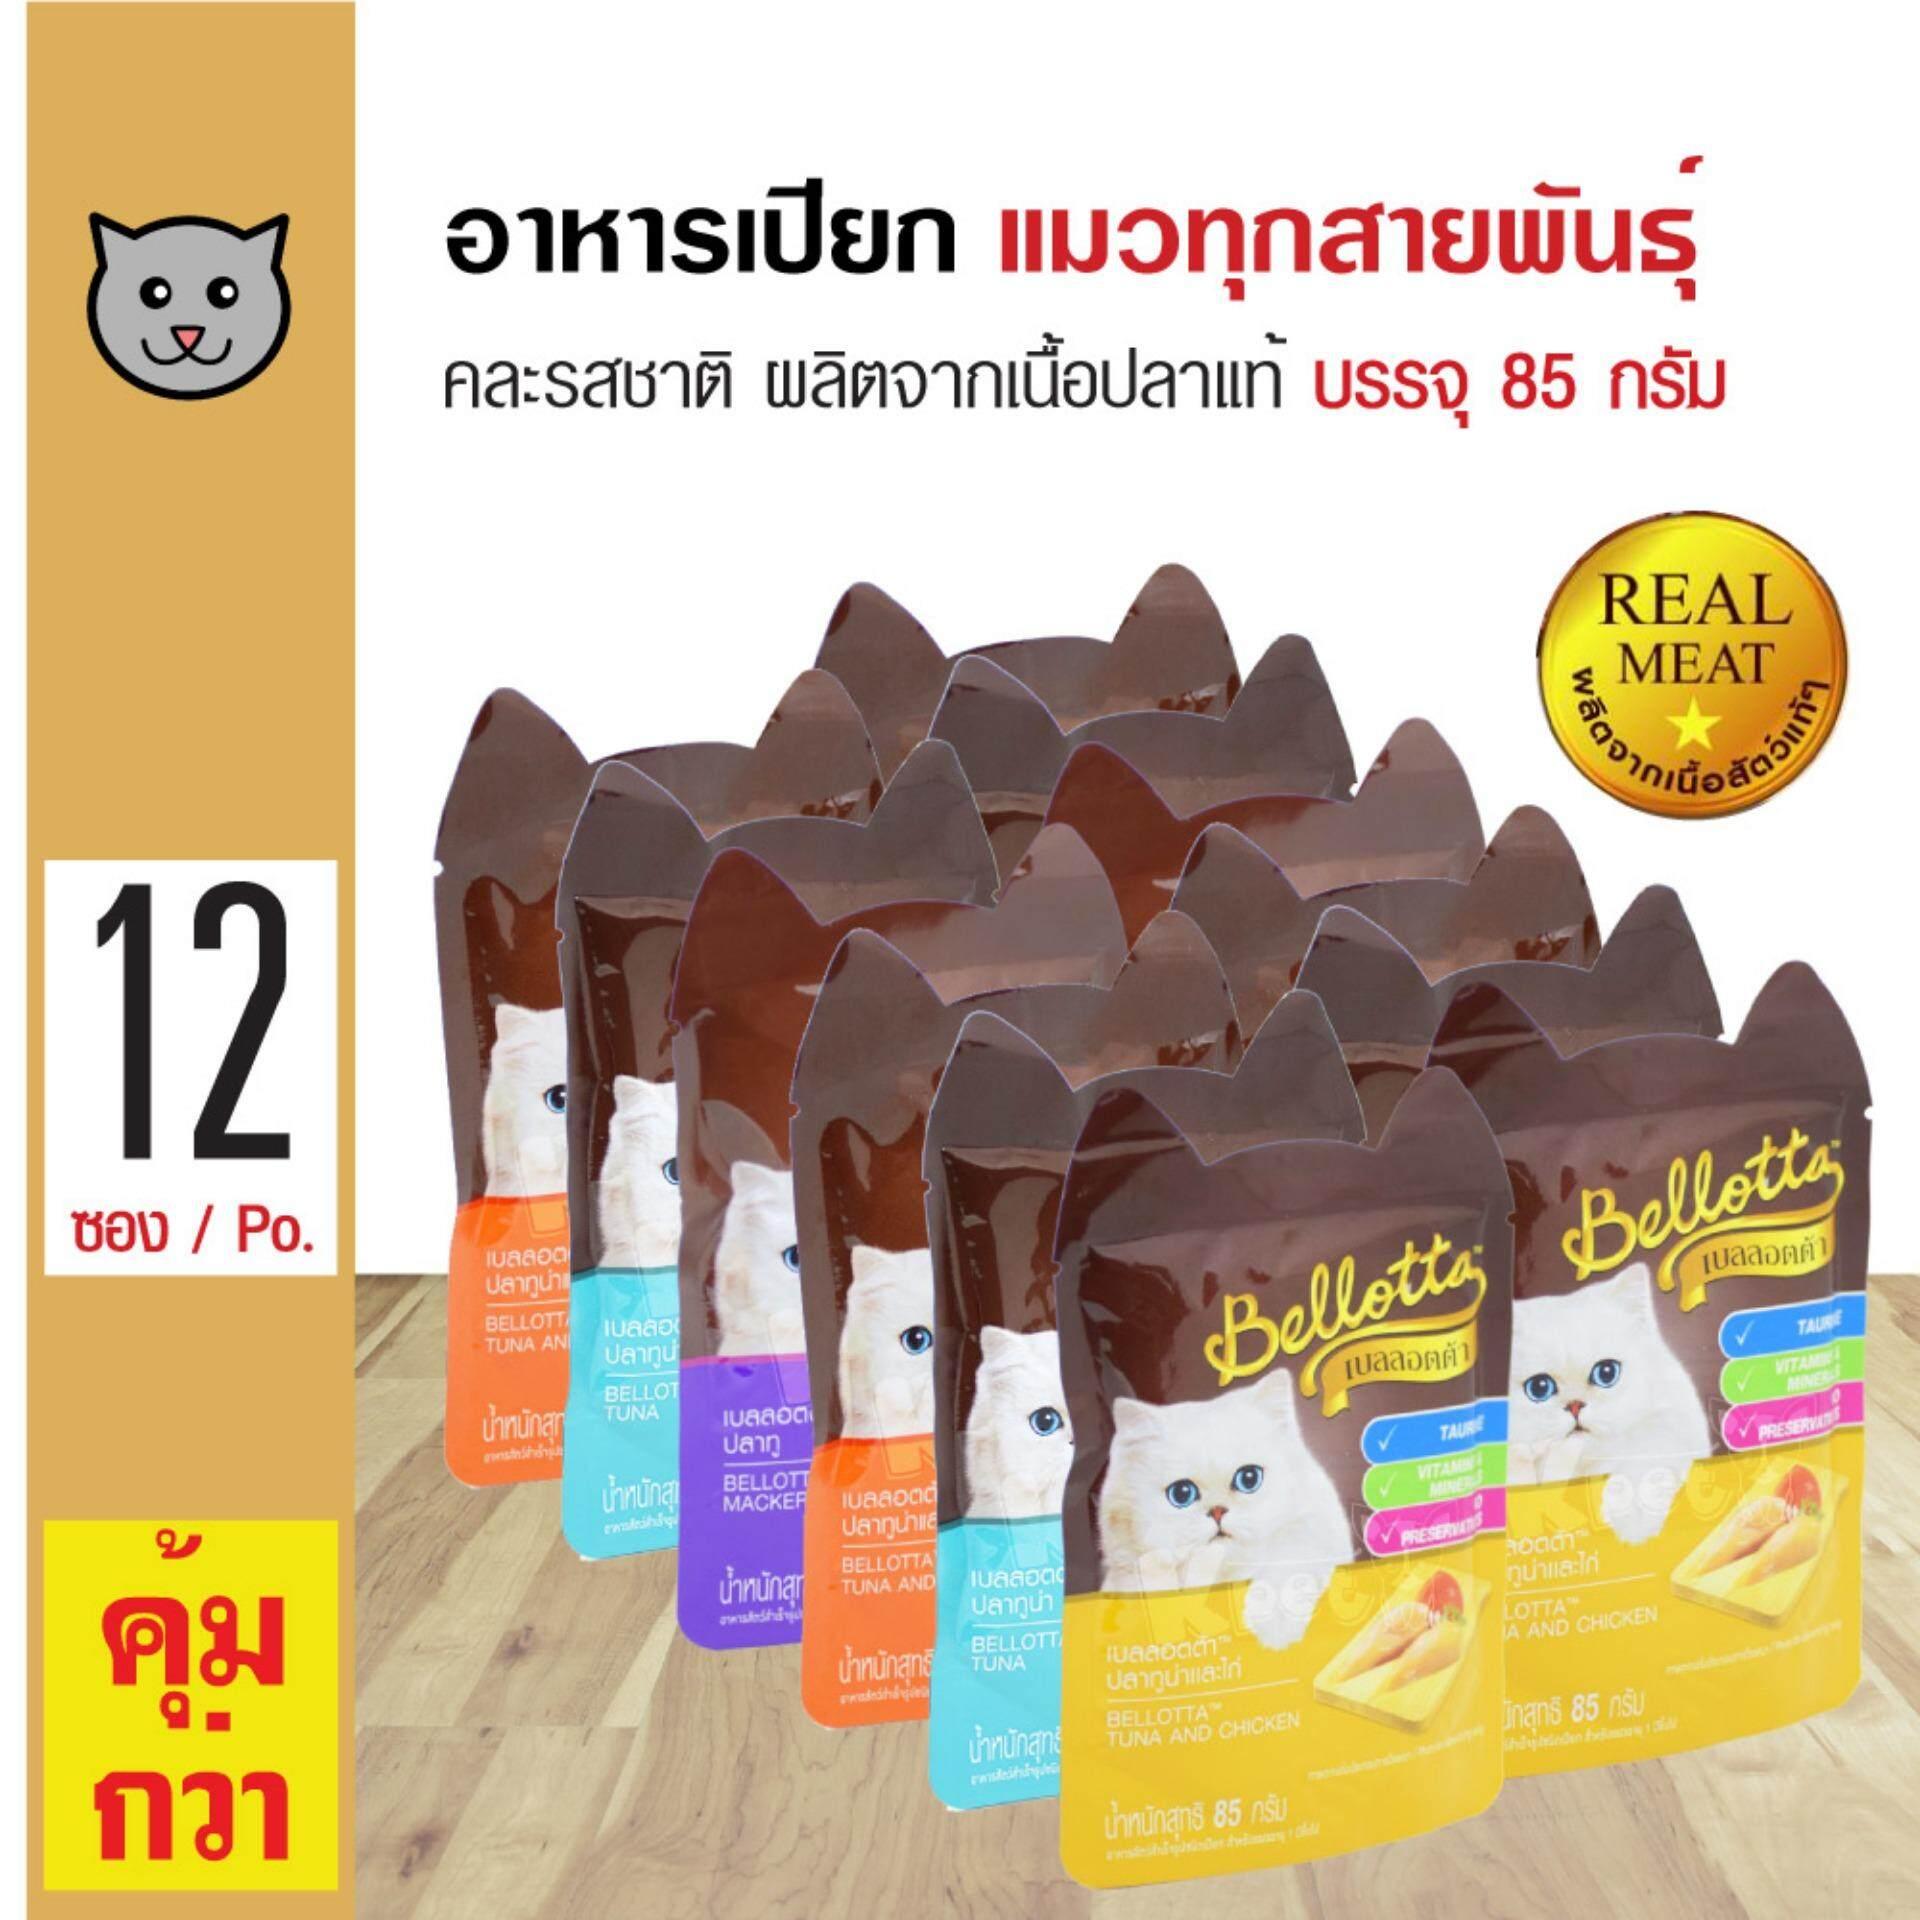 Bellotta Cat Pouch อาหารเปียก คละรสชาติ ทานง่าย สำหรับแมว 4 เดือนขึ้นไป ขนาด 85 กรัม X 12 ซอง By Kpet.